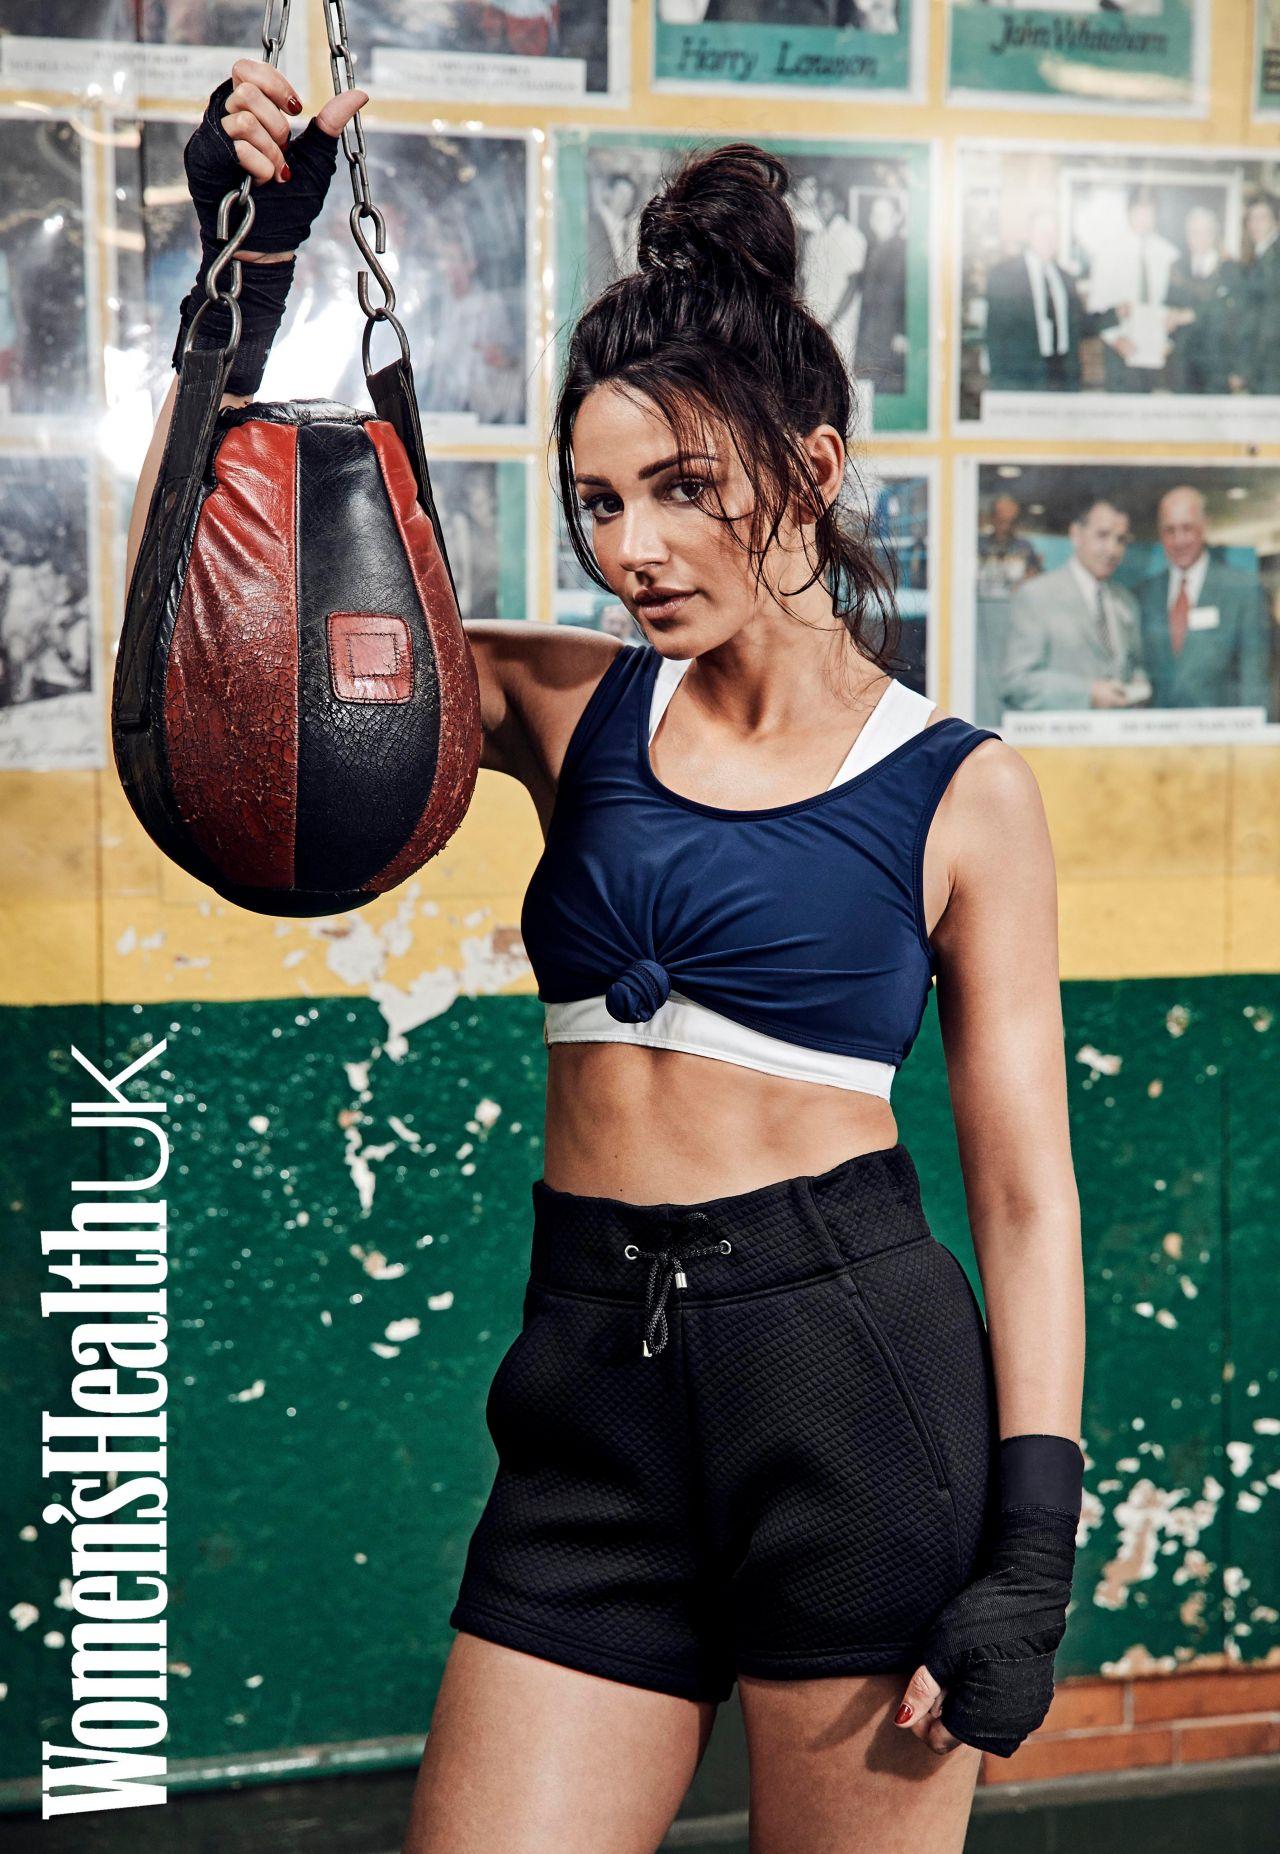 Michelle Keegan - Women's Health Magazine November 2017